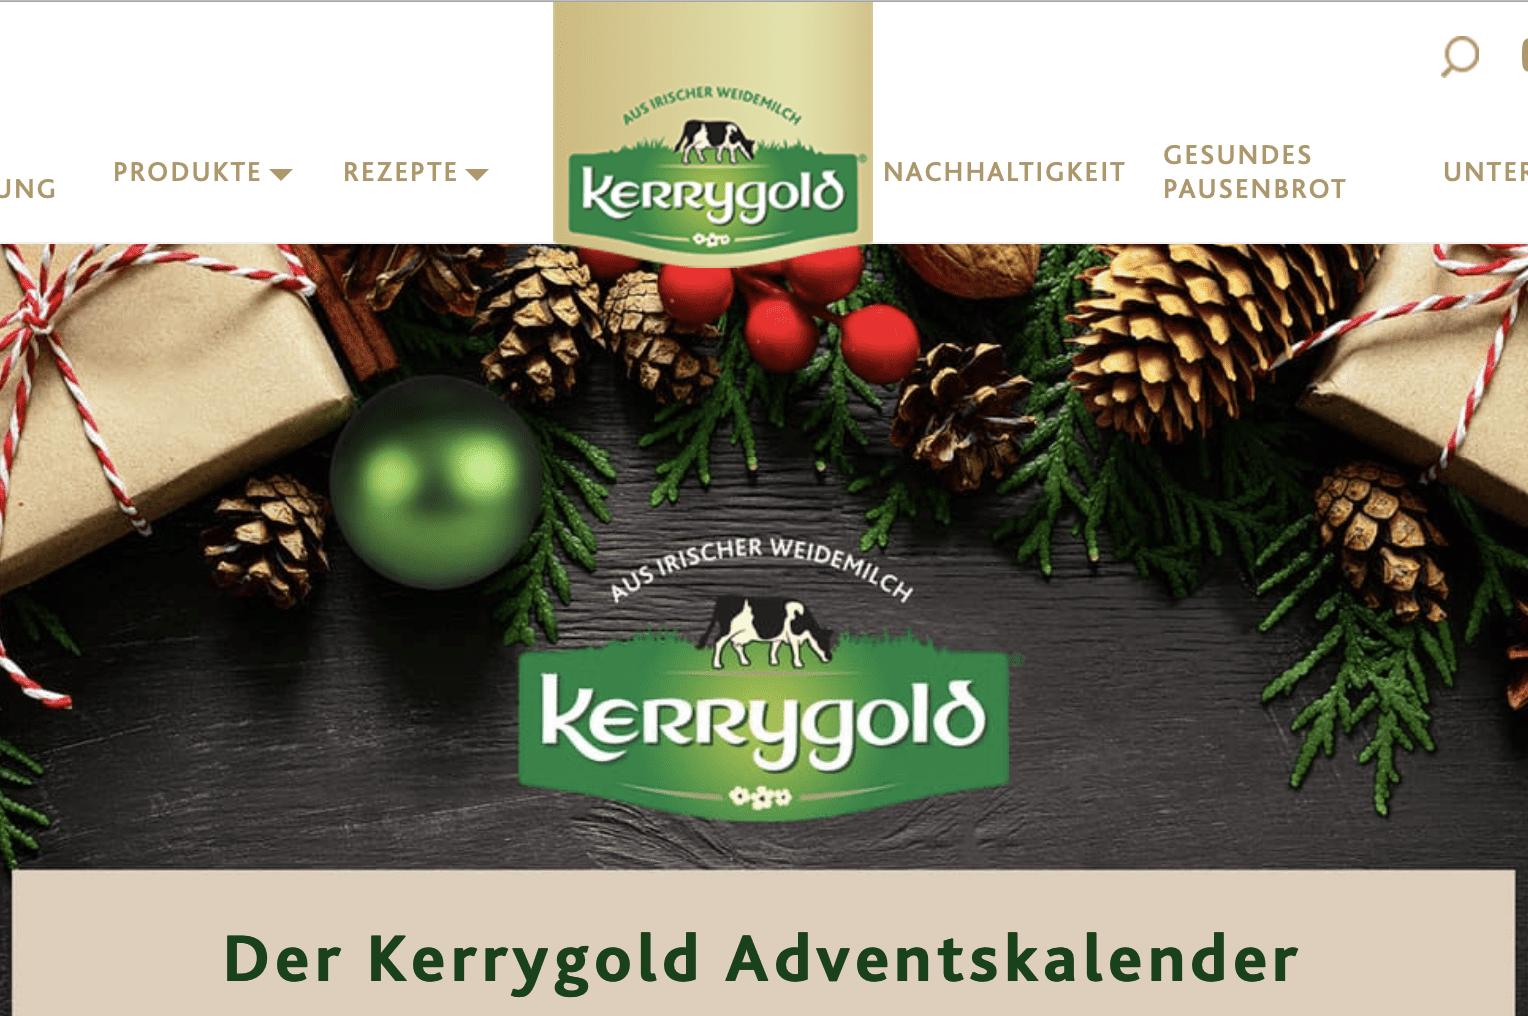 Kerrygold Cases Adventskalender-Gewinnspiel